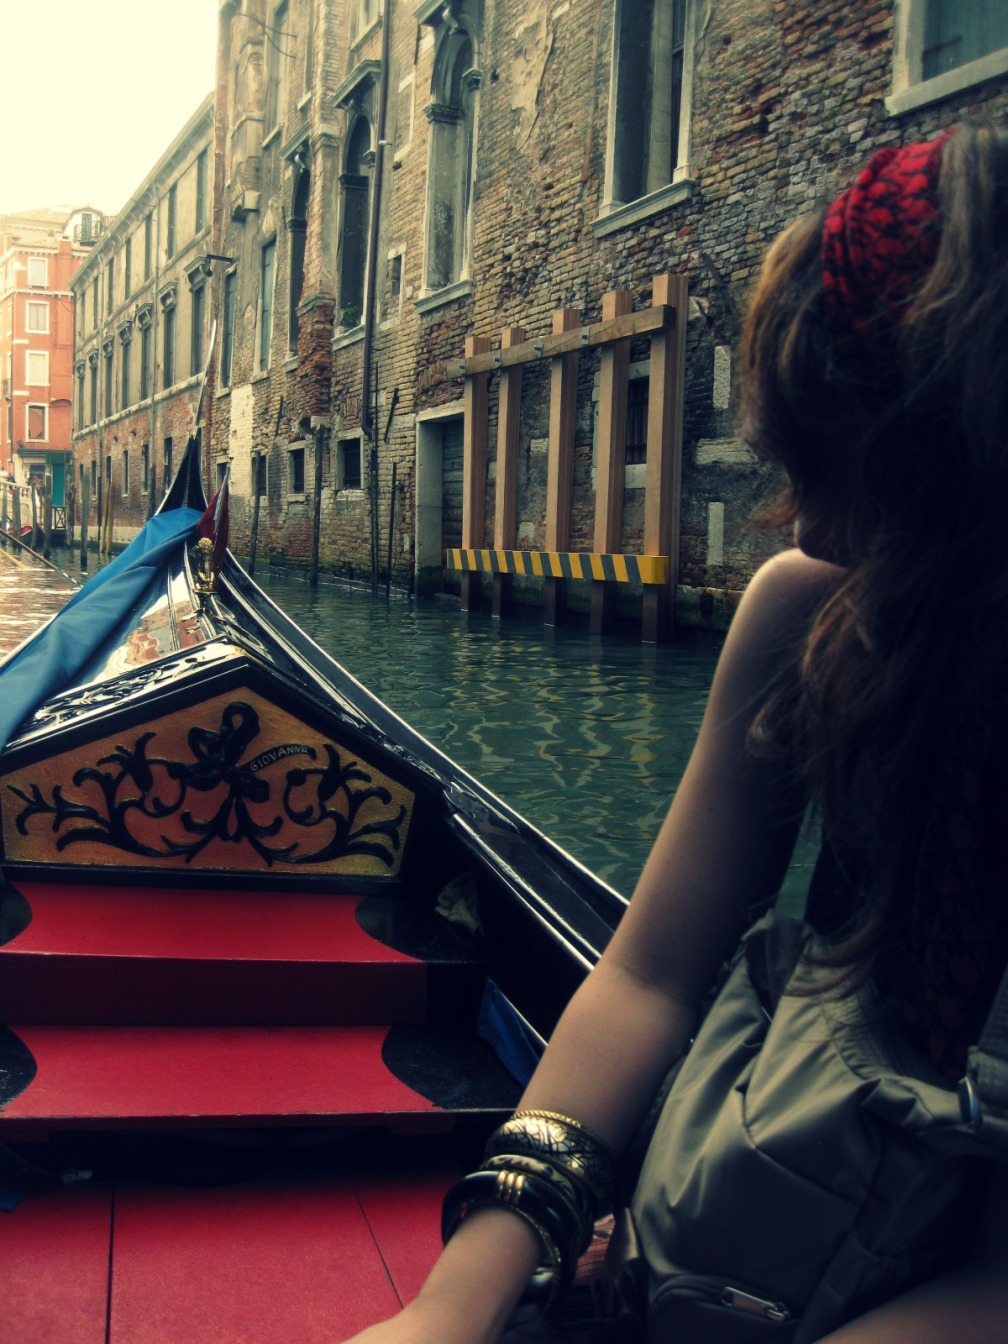 The Gondola Ride